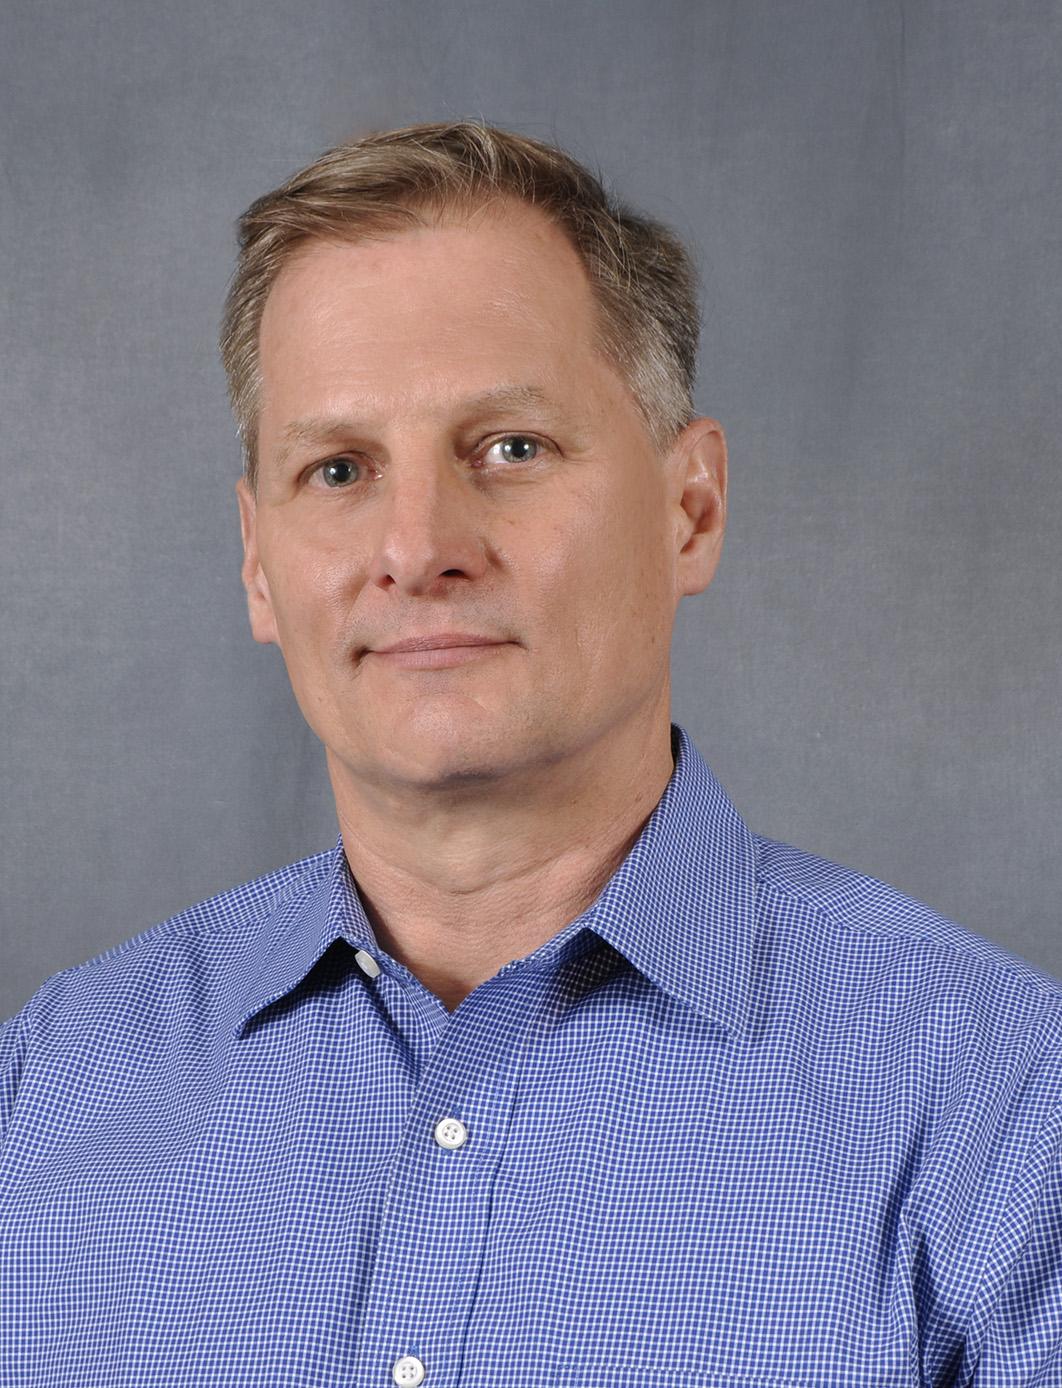 Mid-Pacific Region's Public Affairs Officer Jeff Hawk